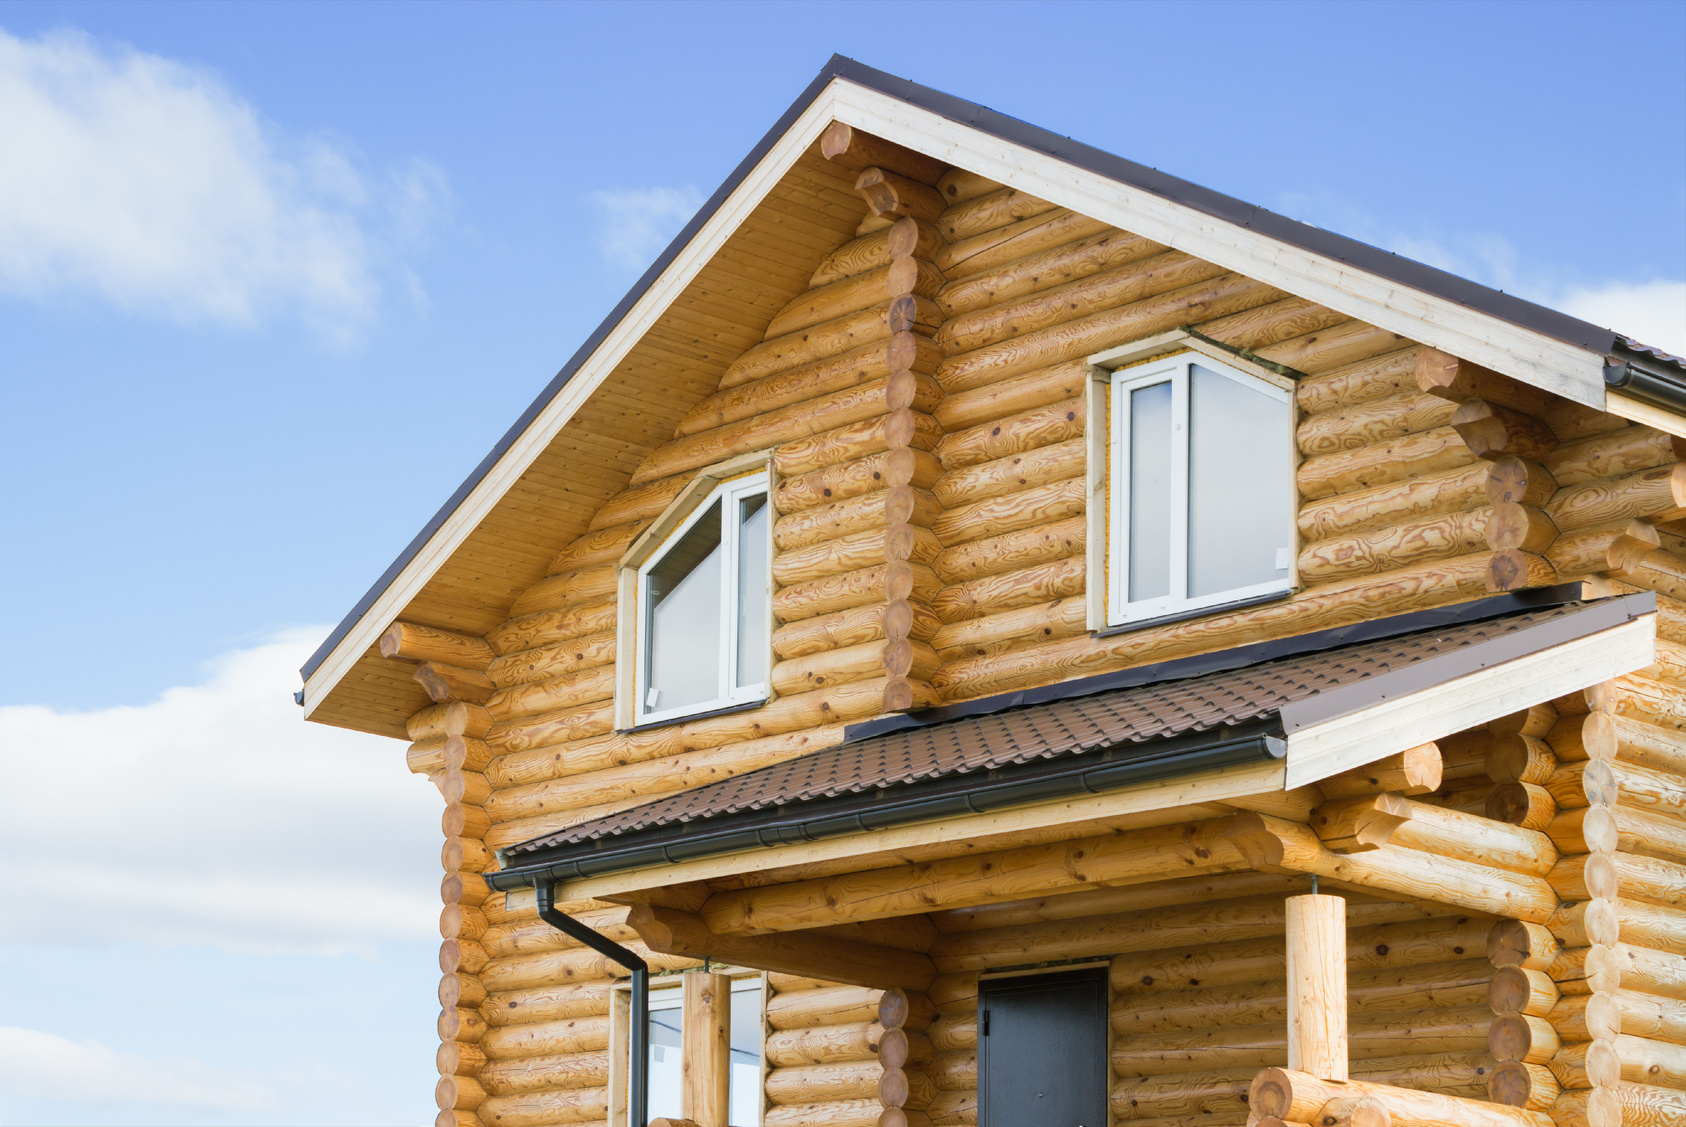 Comprar casa de madera archives comprar casas de madera - Tocar madera casas ...